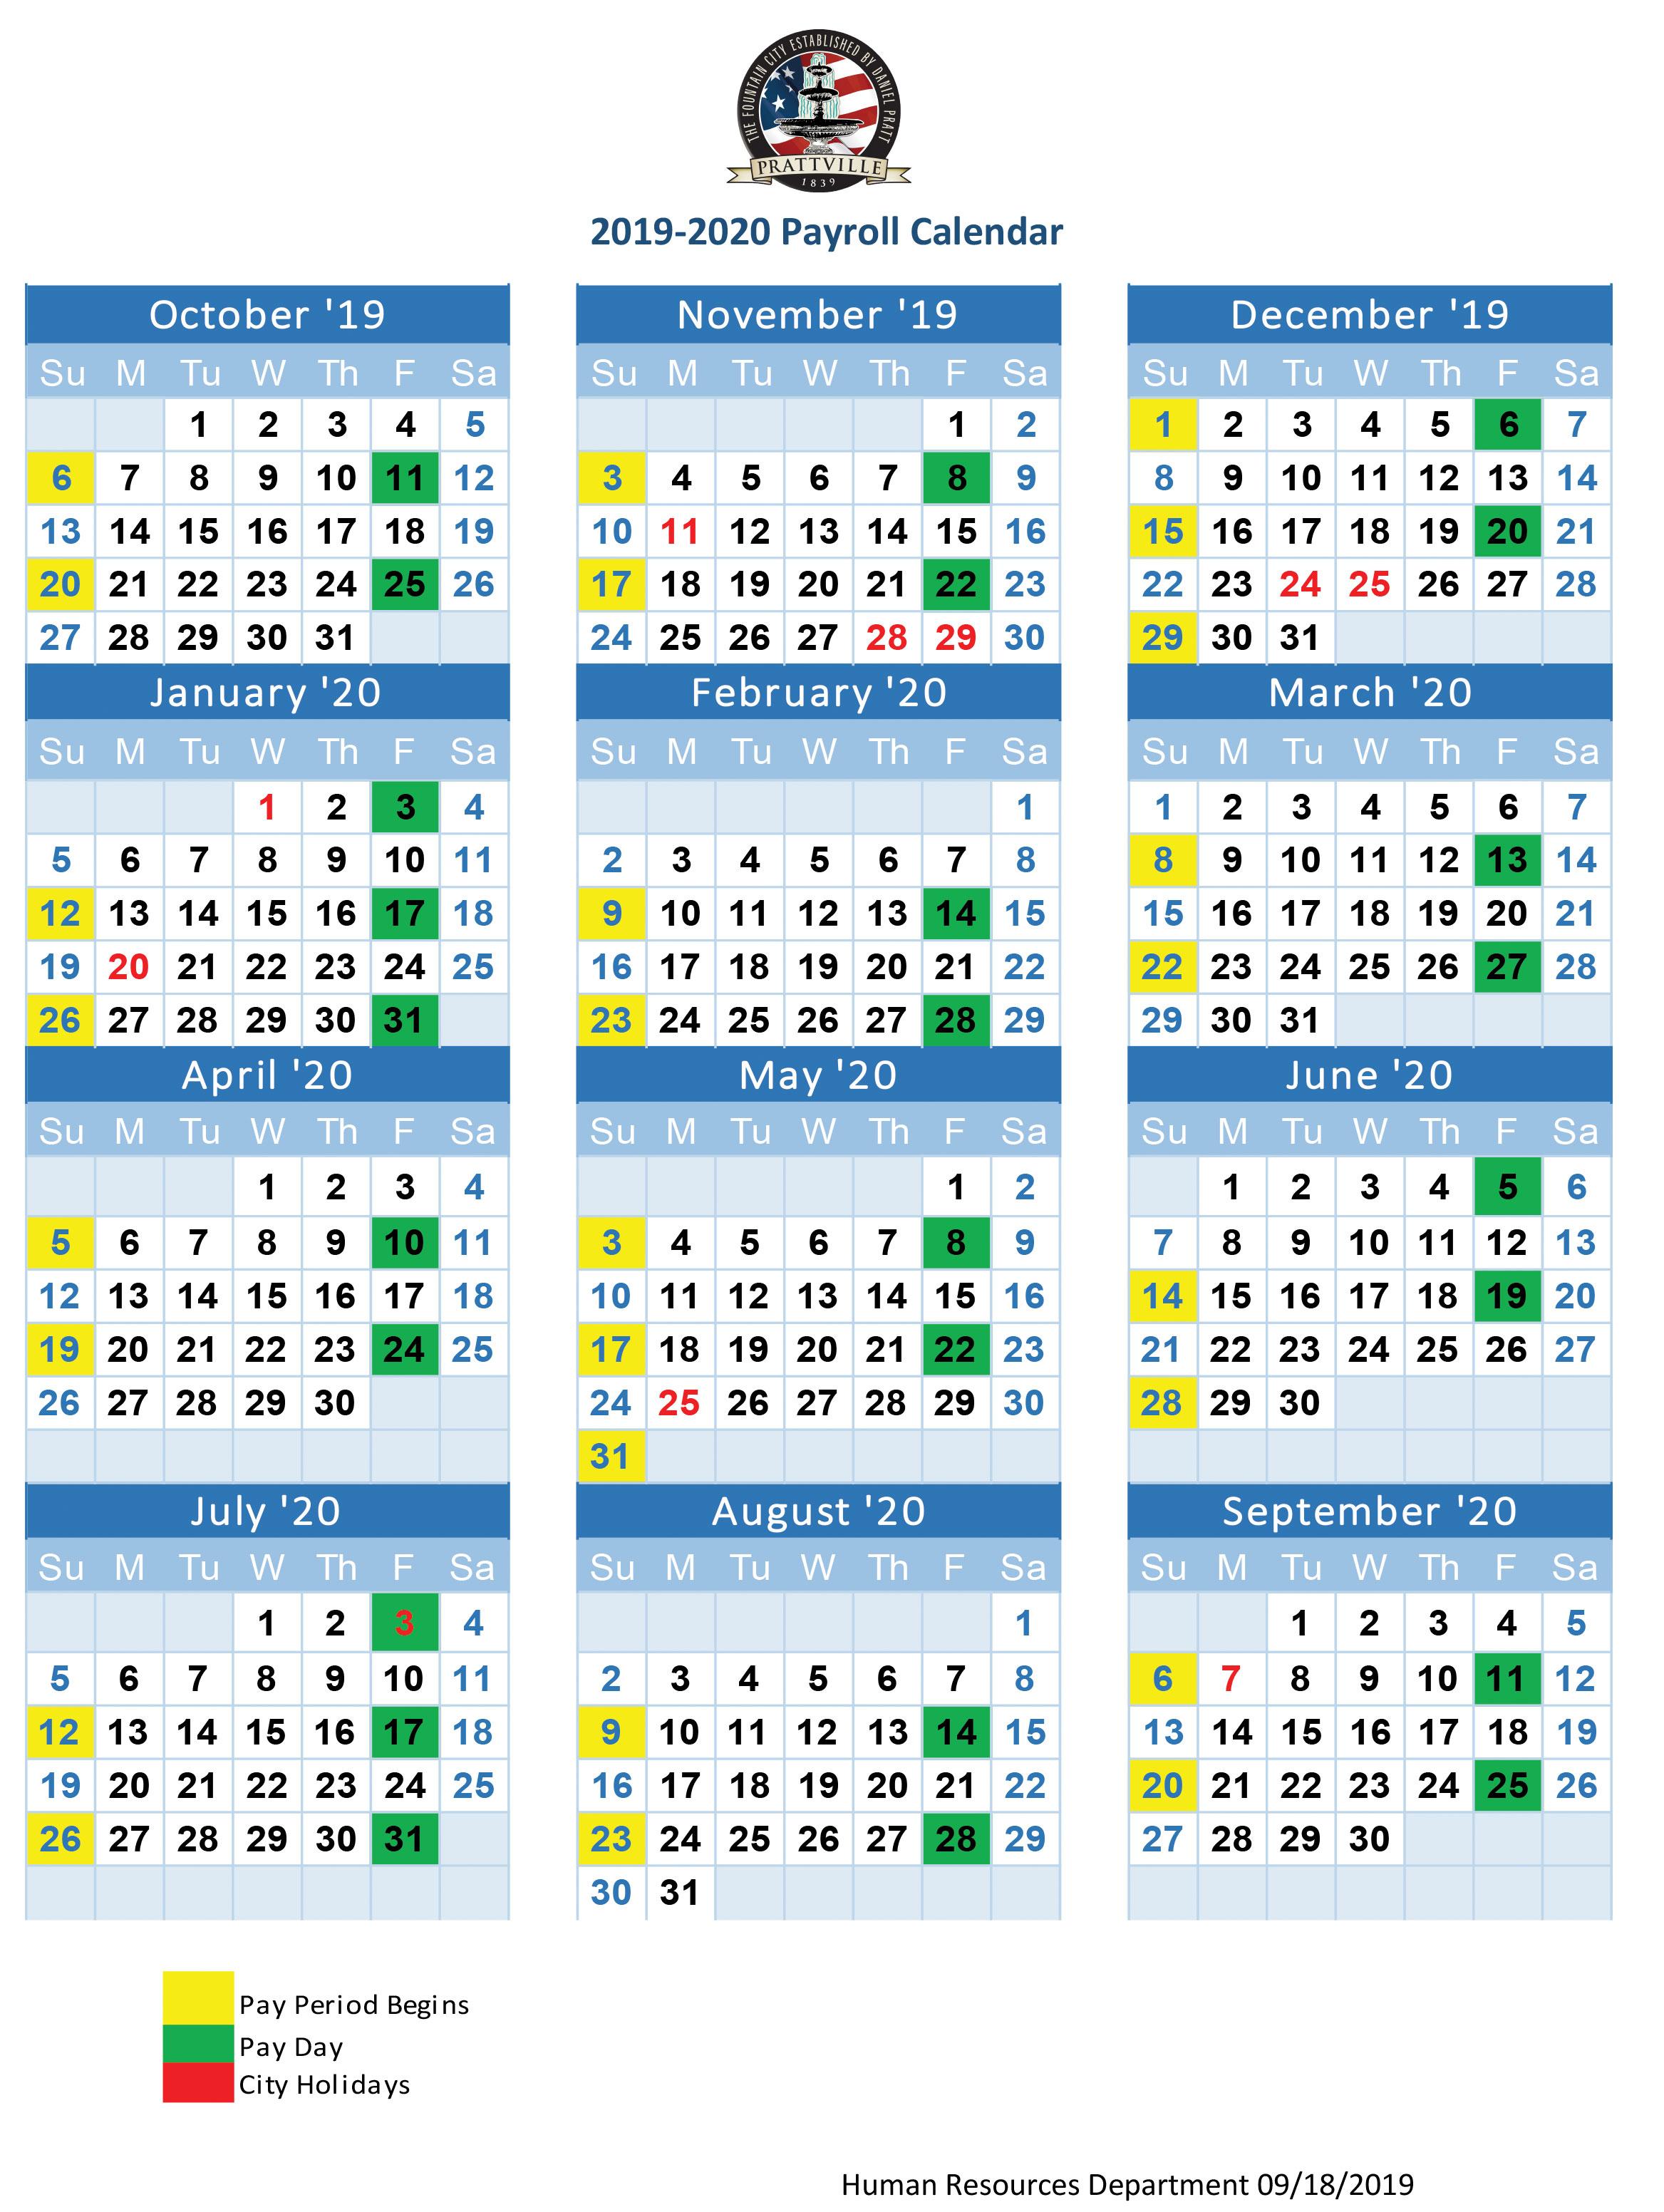 2020 Payroll Calendar  Neyar.kristinejaynephotography intended for Uc Berkeley Biweekly Pay Calendar 2020